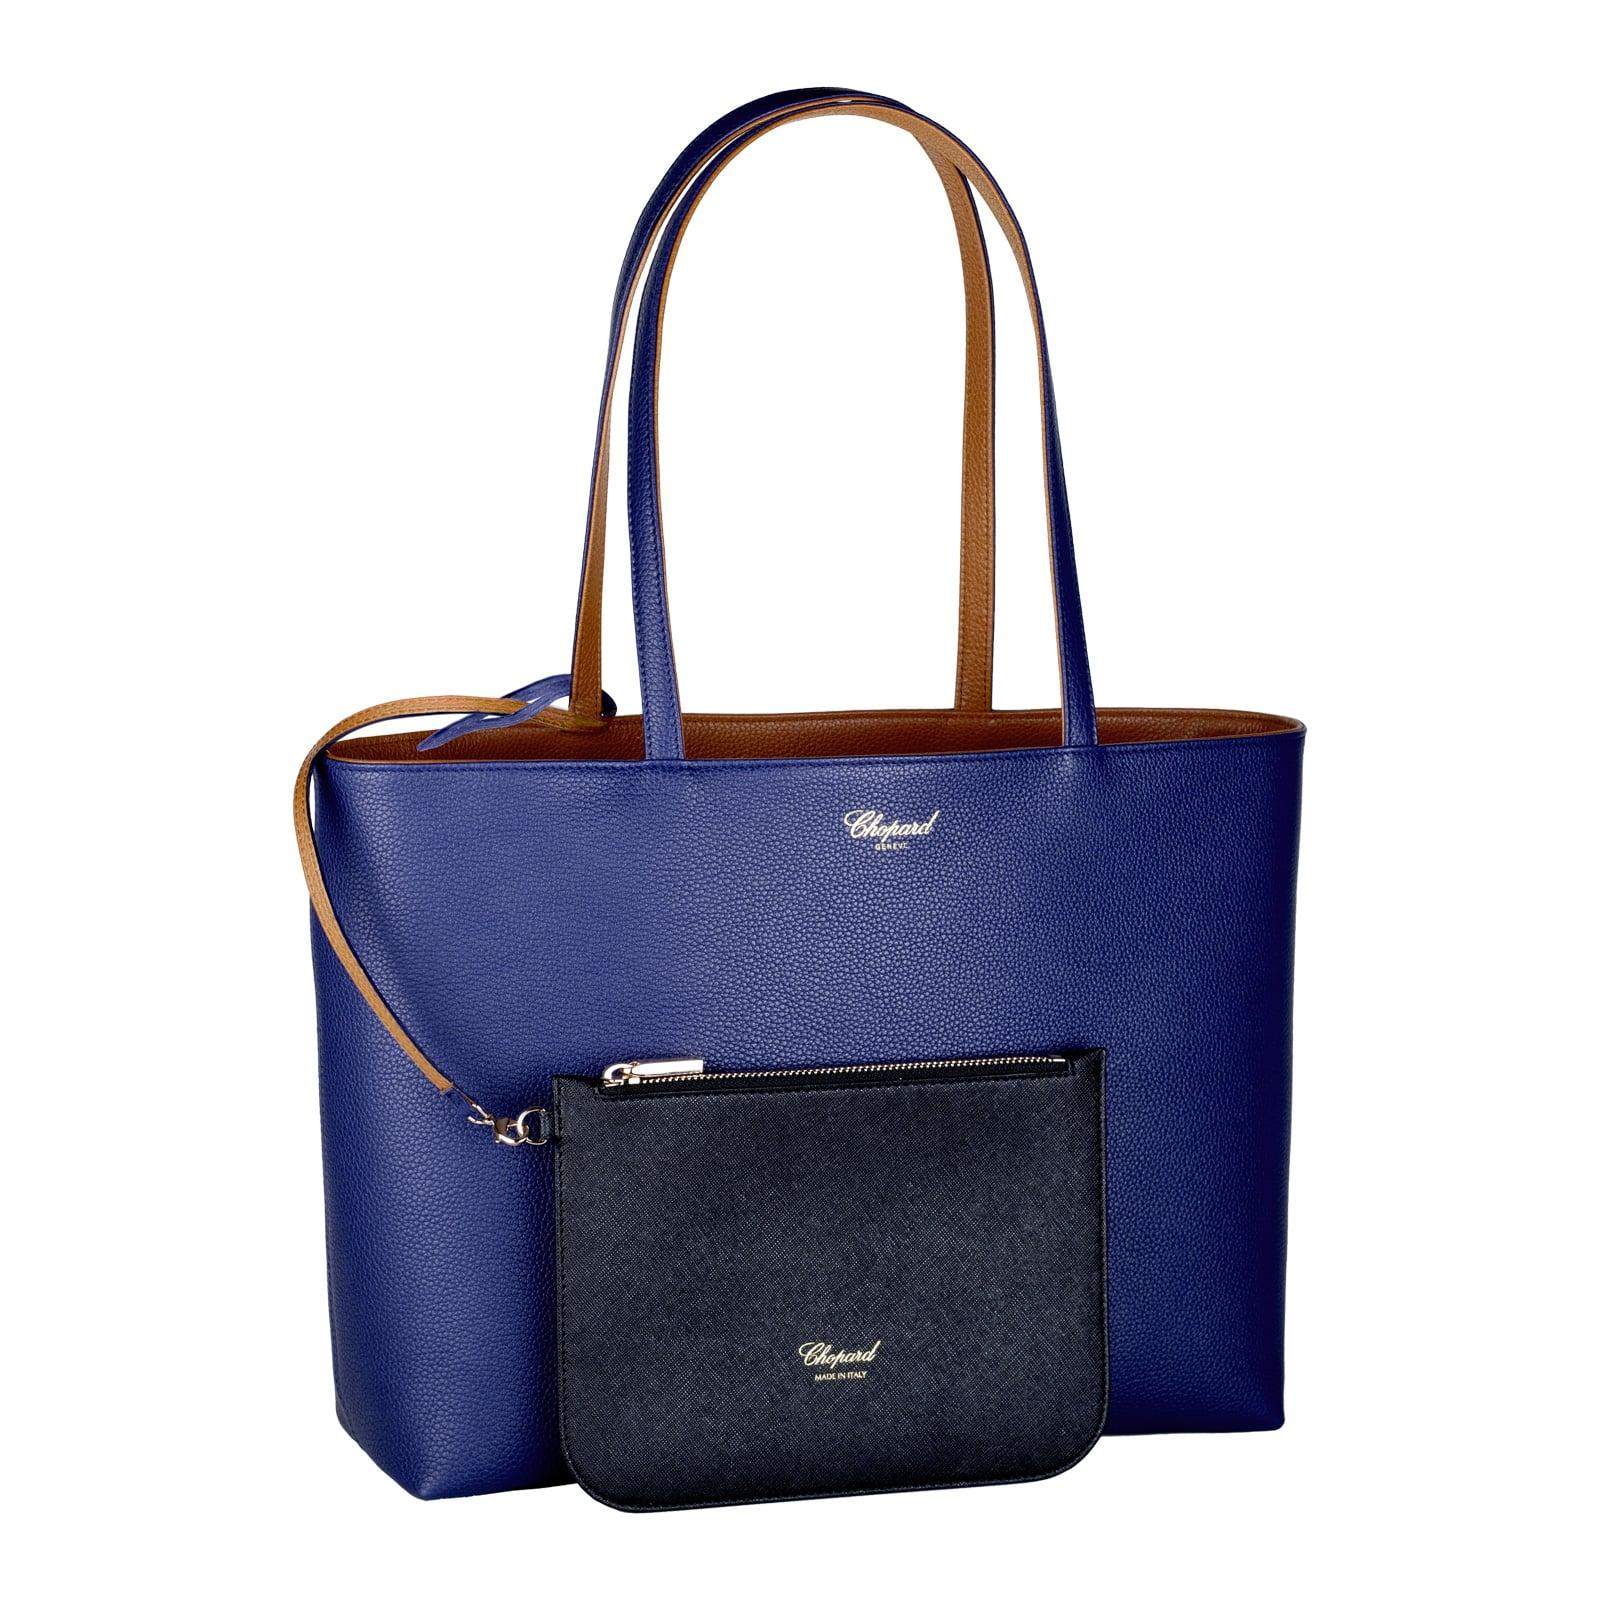 18a34e5d97ef6 Chopard Miss Happy handbag - Lionel Meylan Vevey